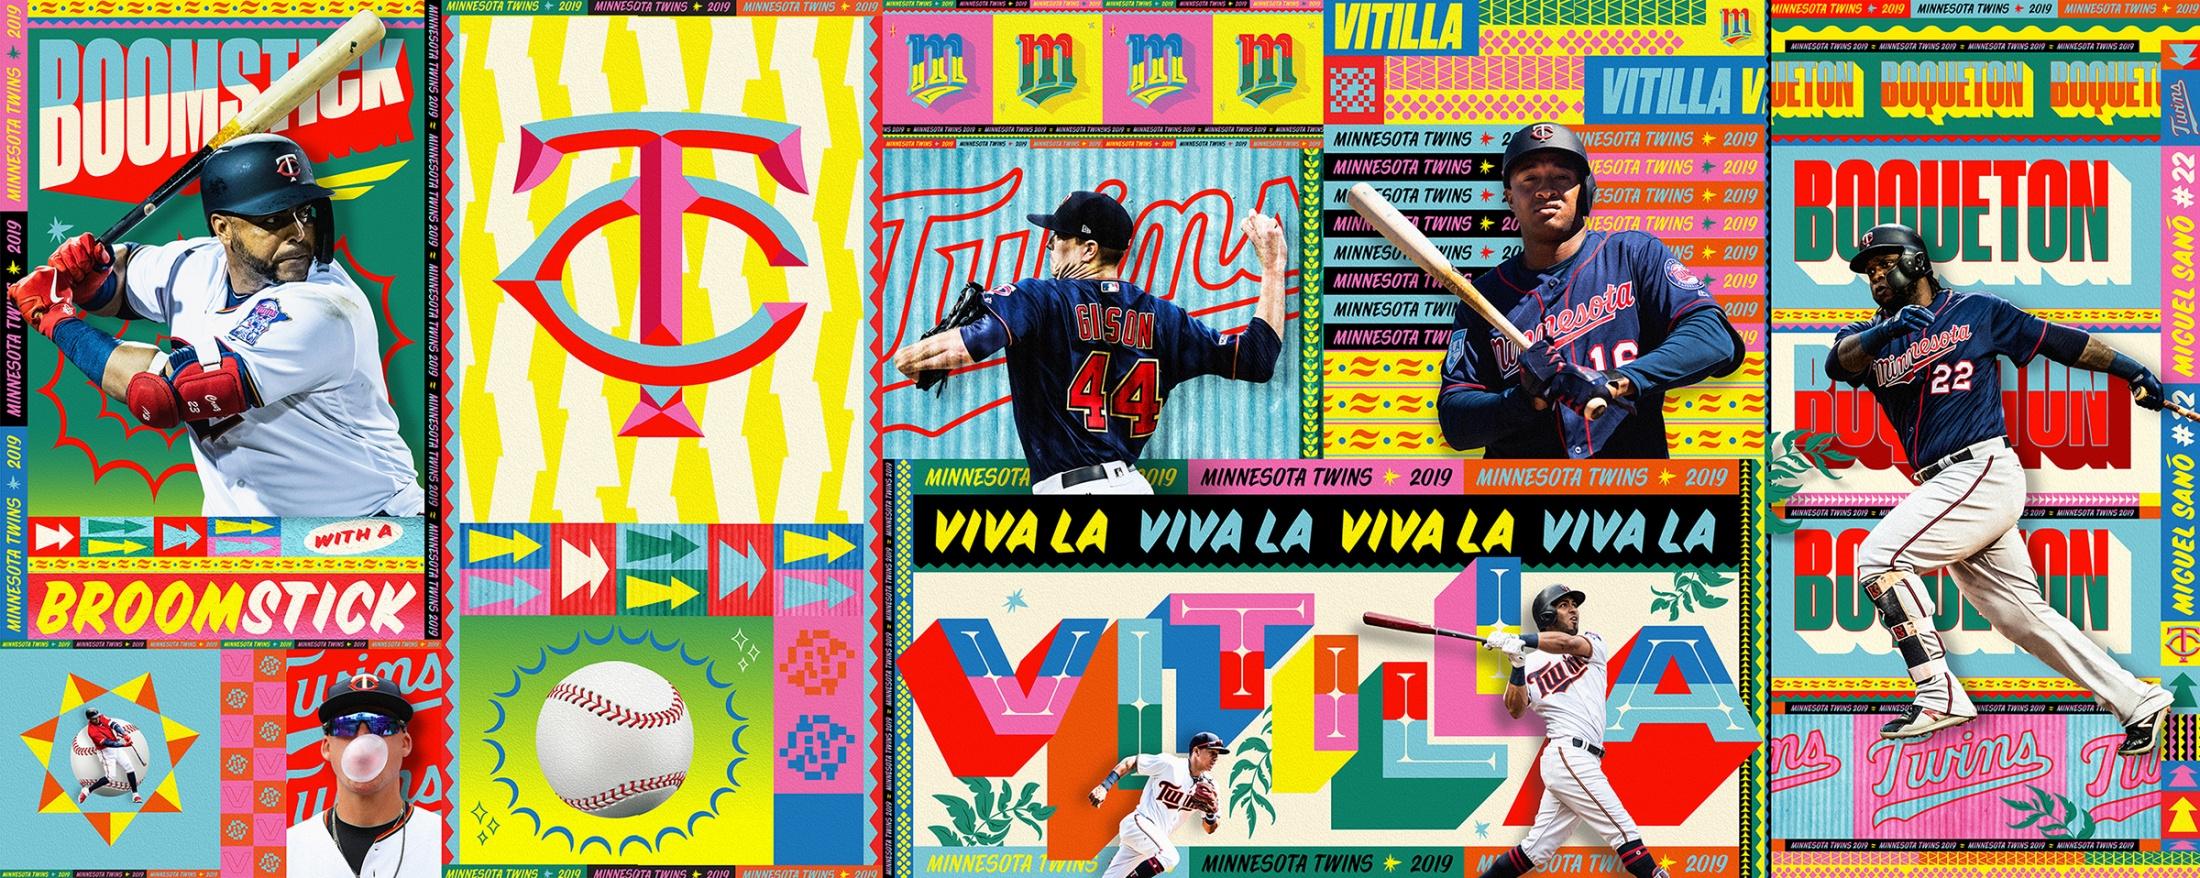 Thumbnail for Minnesota Twins Mall Ball: Vitilla-Style